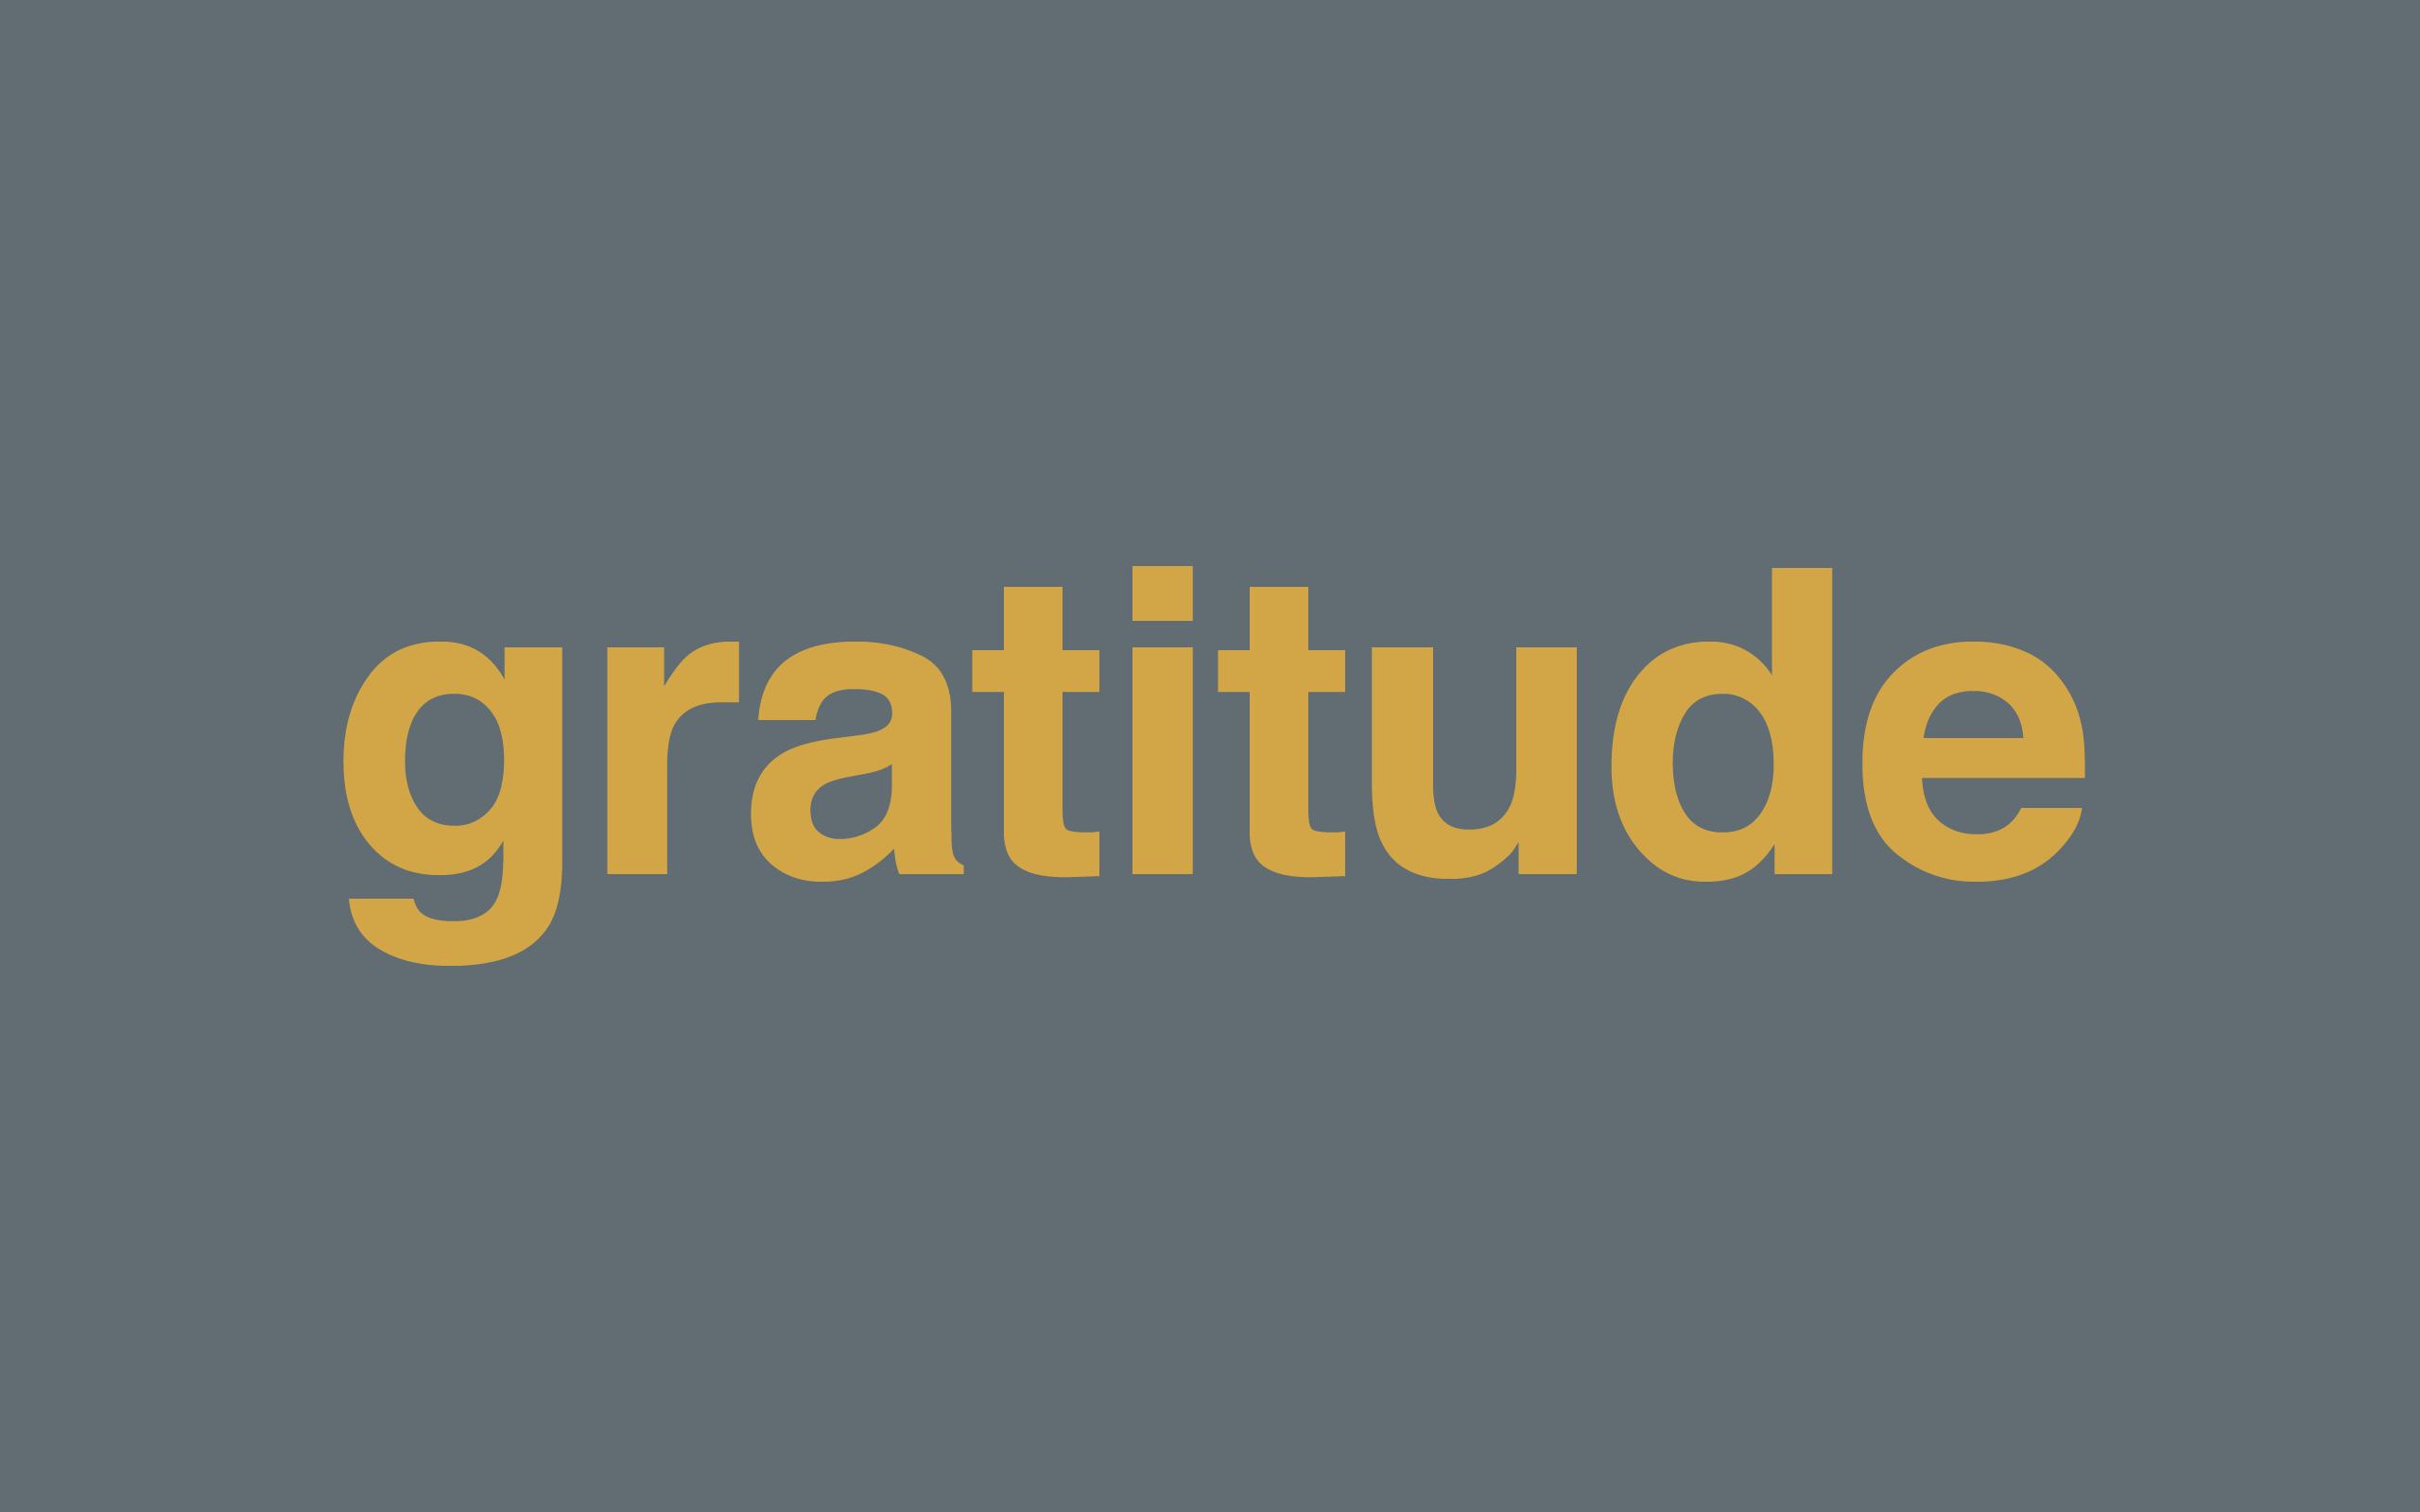 wednesday wallpaper gratitude brings - photo #29